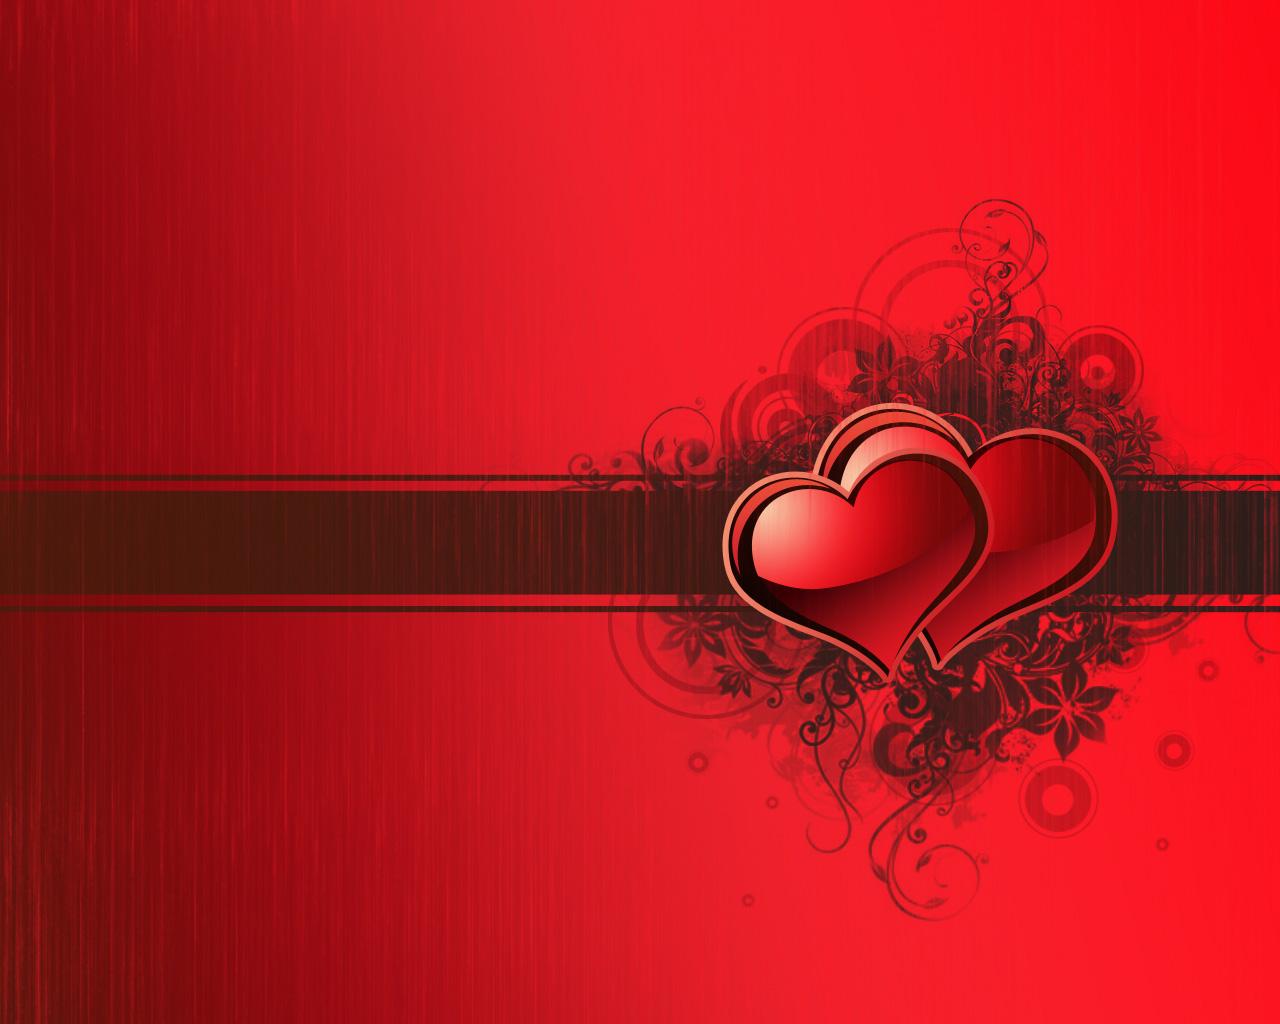 Valentines Day Wallpaper 1280x1024